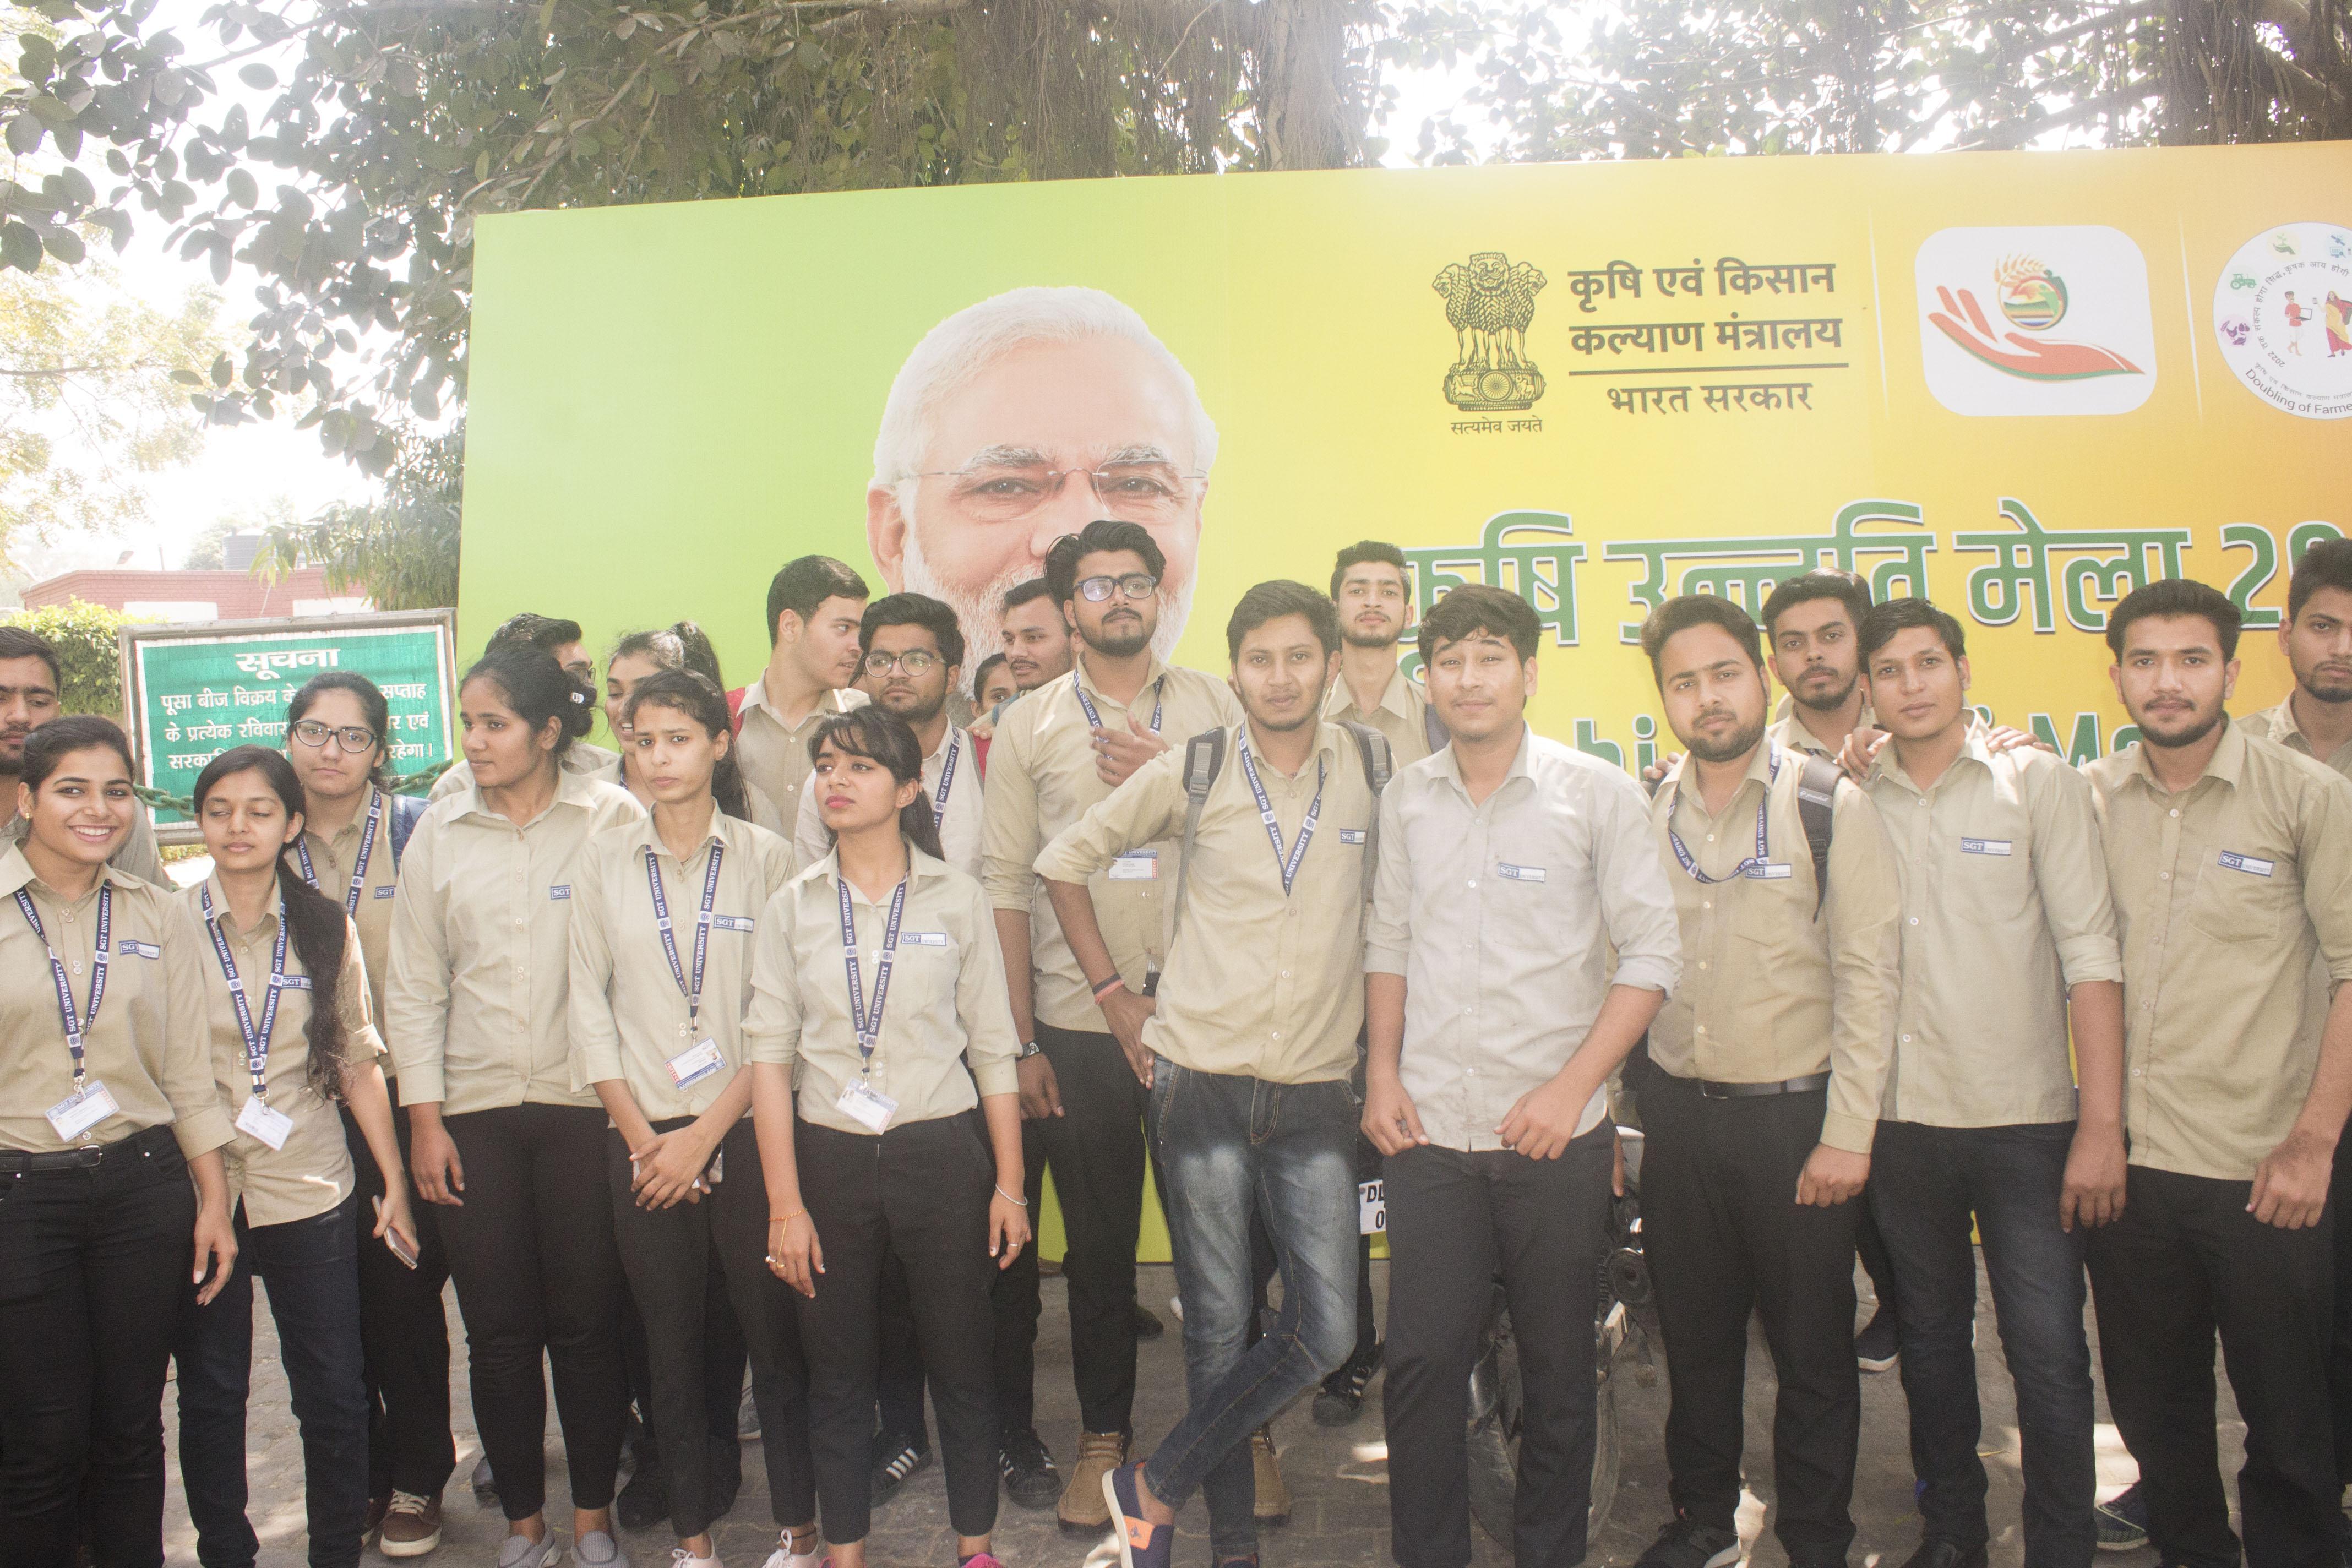 Kisan Mela Visit at ICAR-IARI Pusa Campus, New Delhi